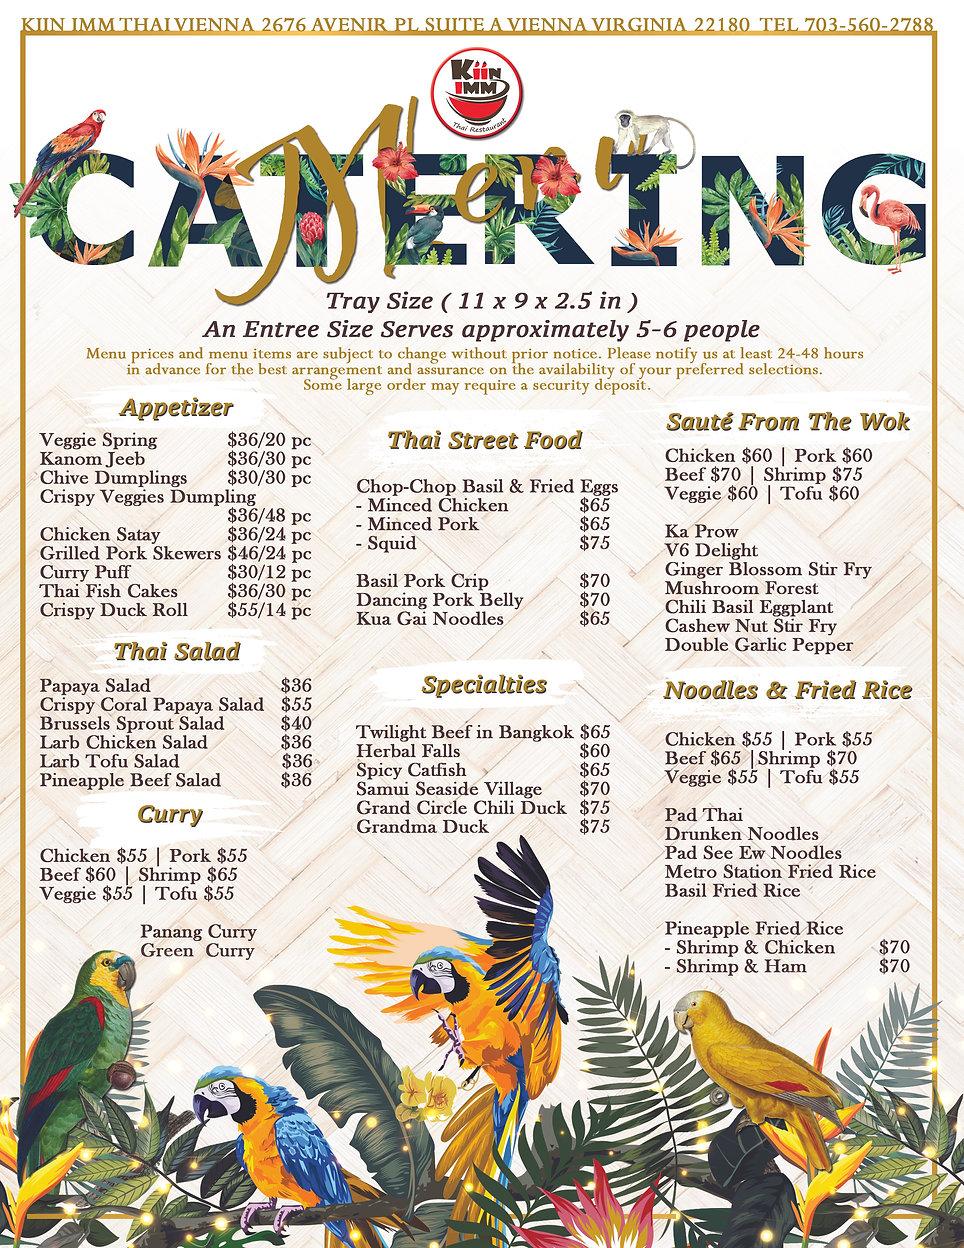 Catering Menu2021.jpg